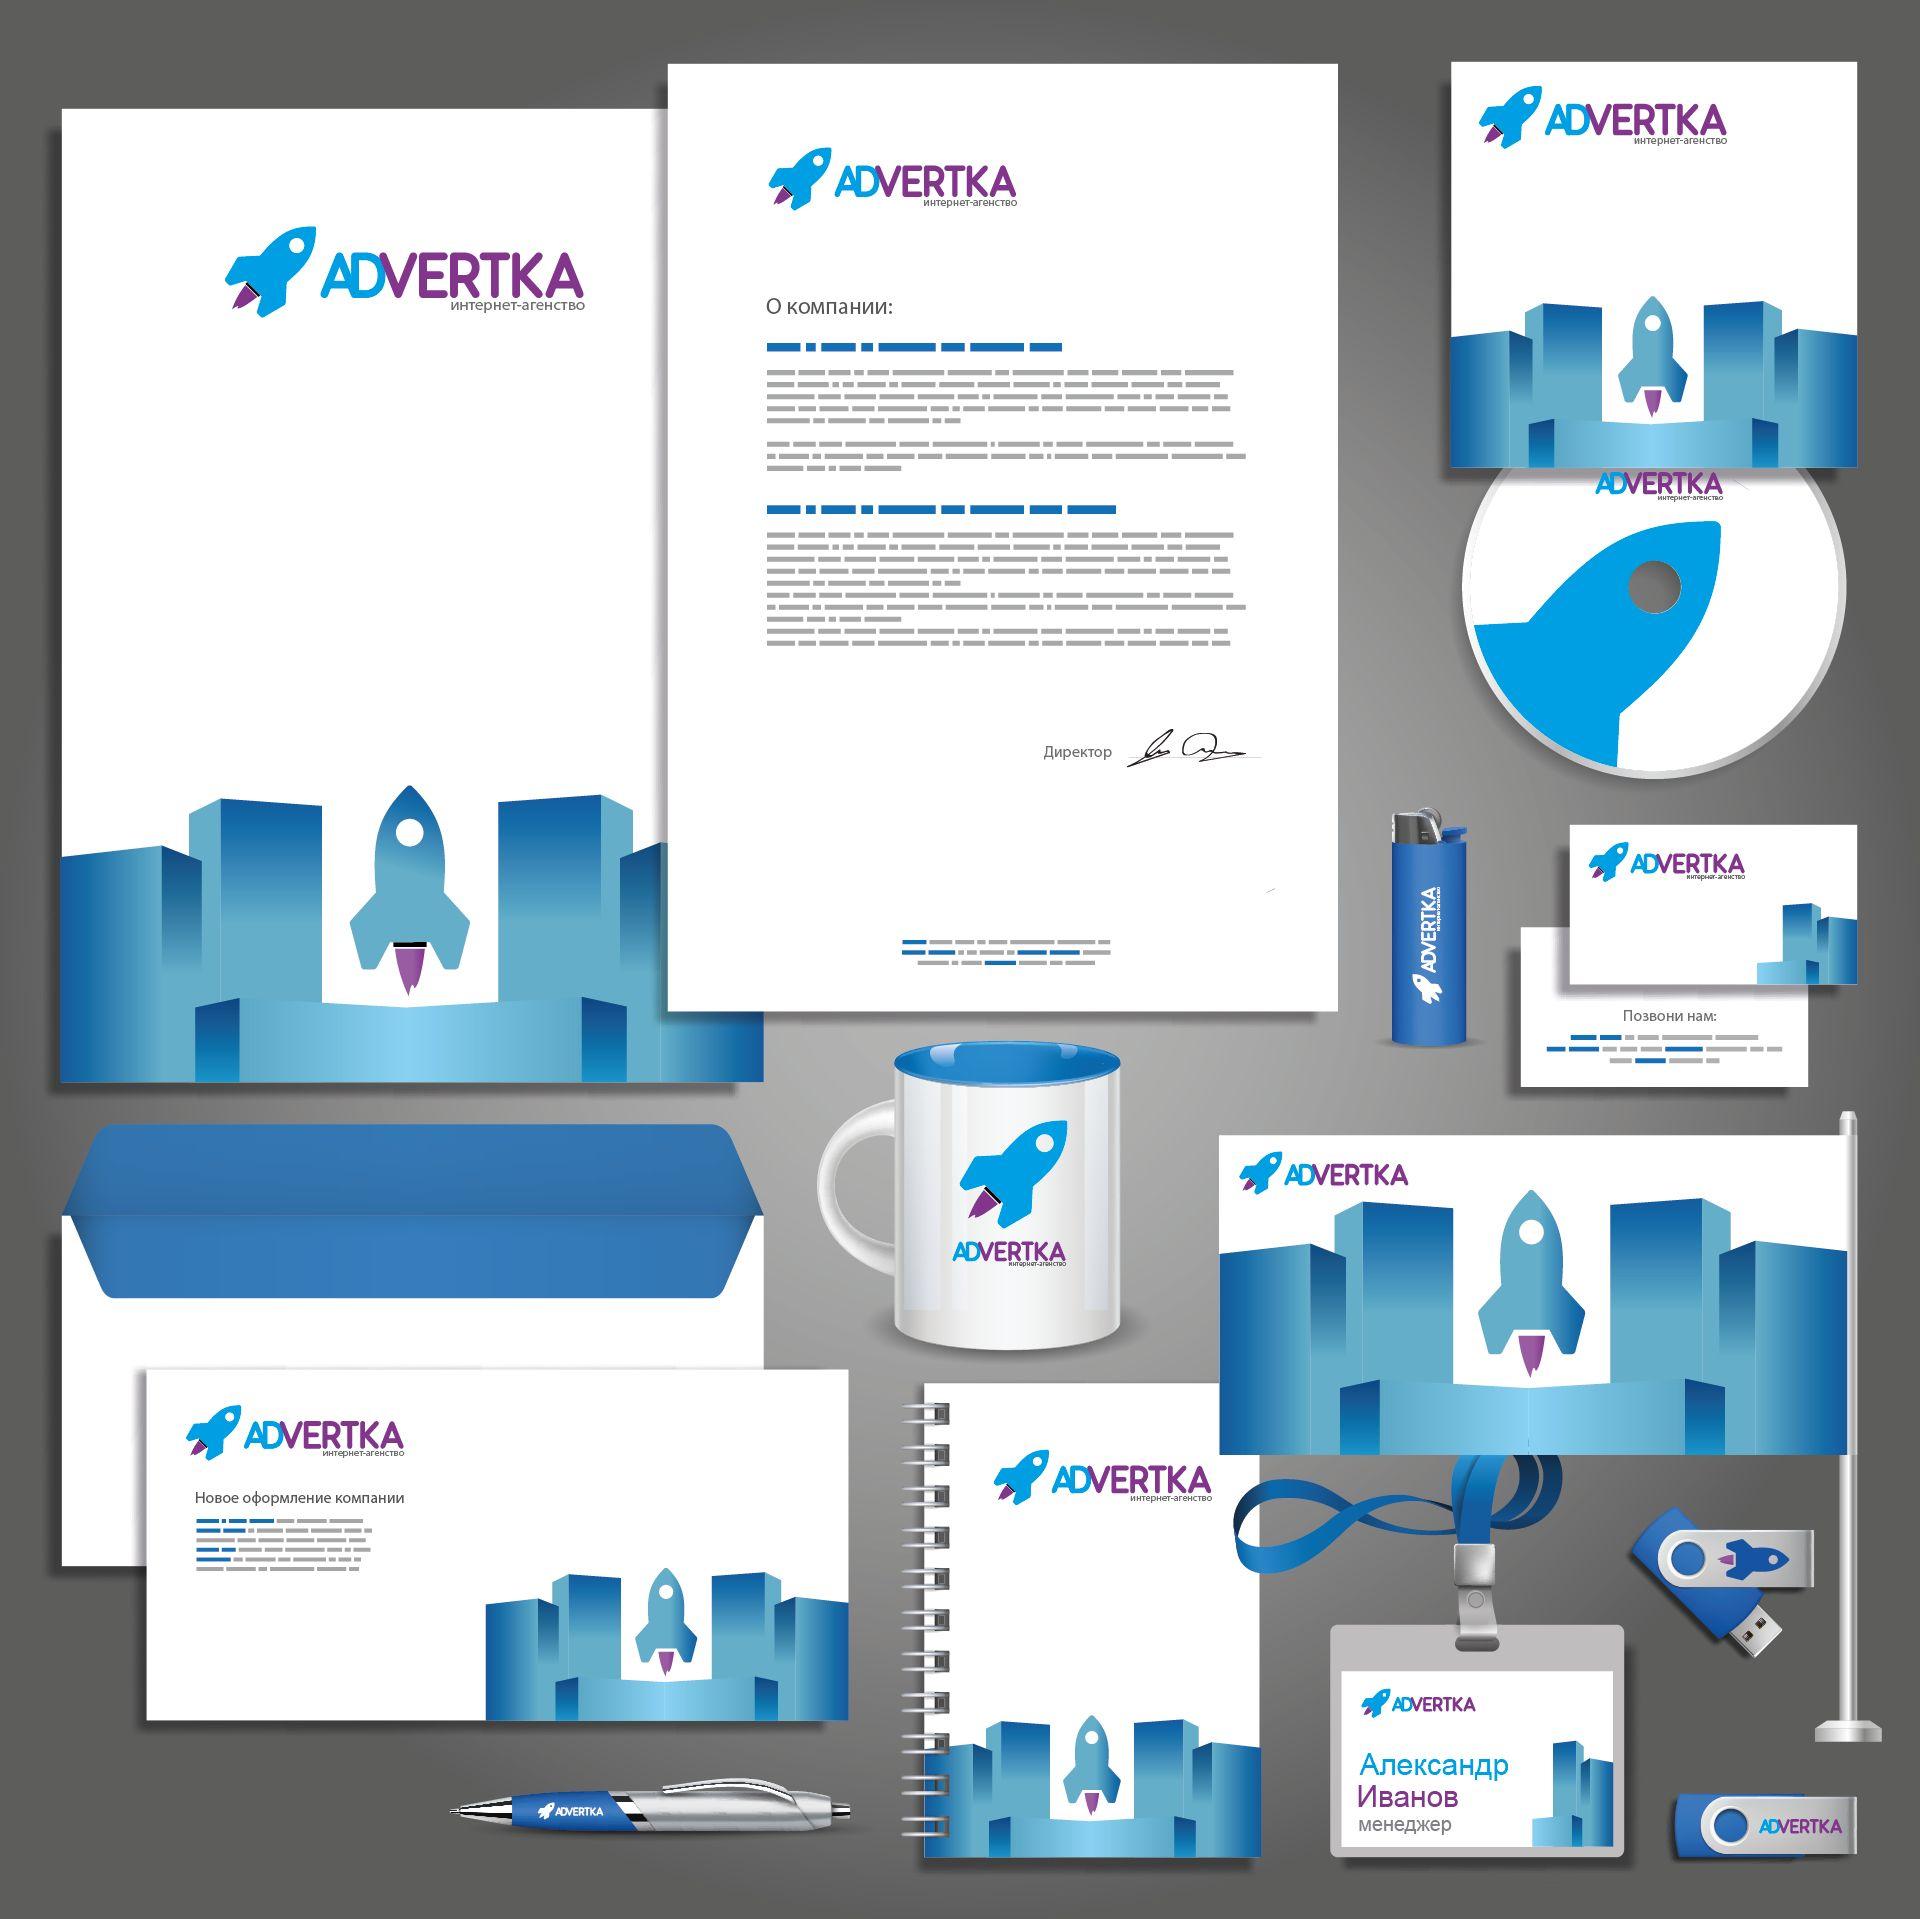 логотип для интернет агентства ADvertka - дизайнер alpine-gold